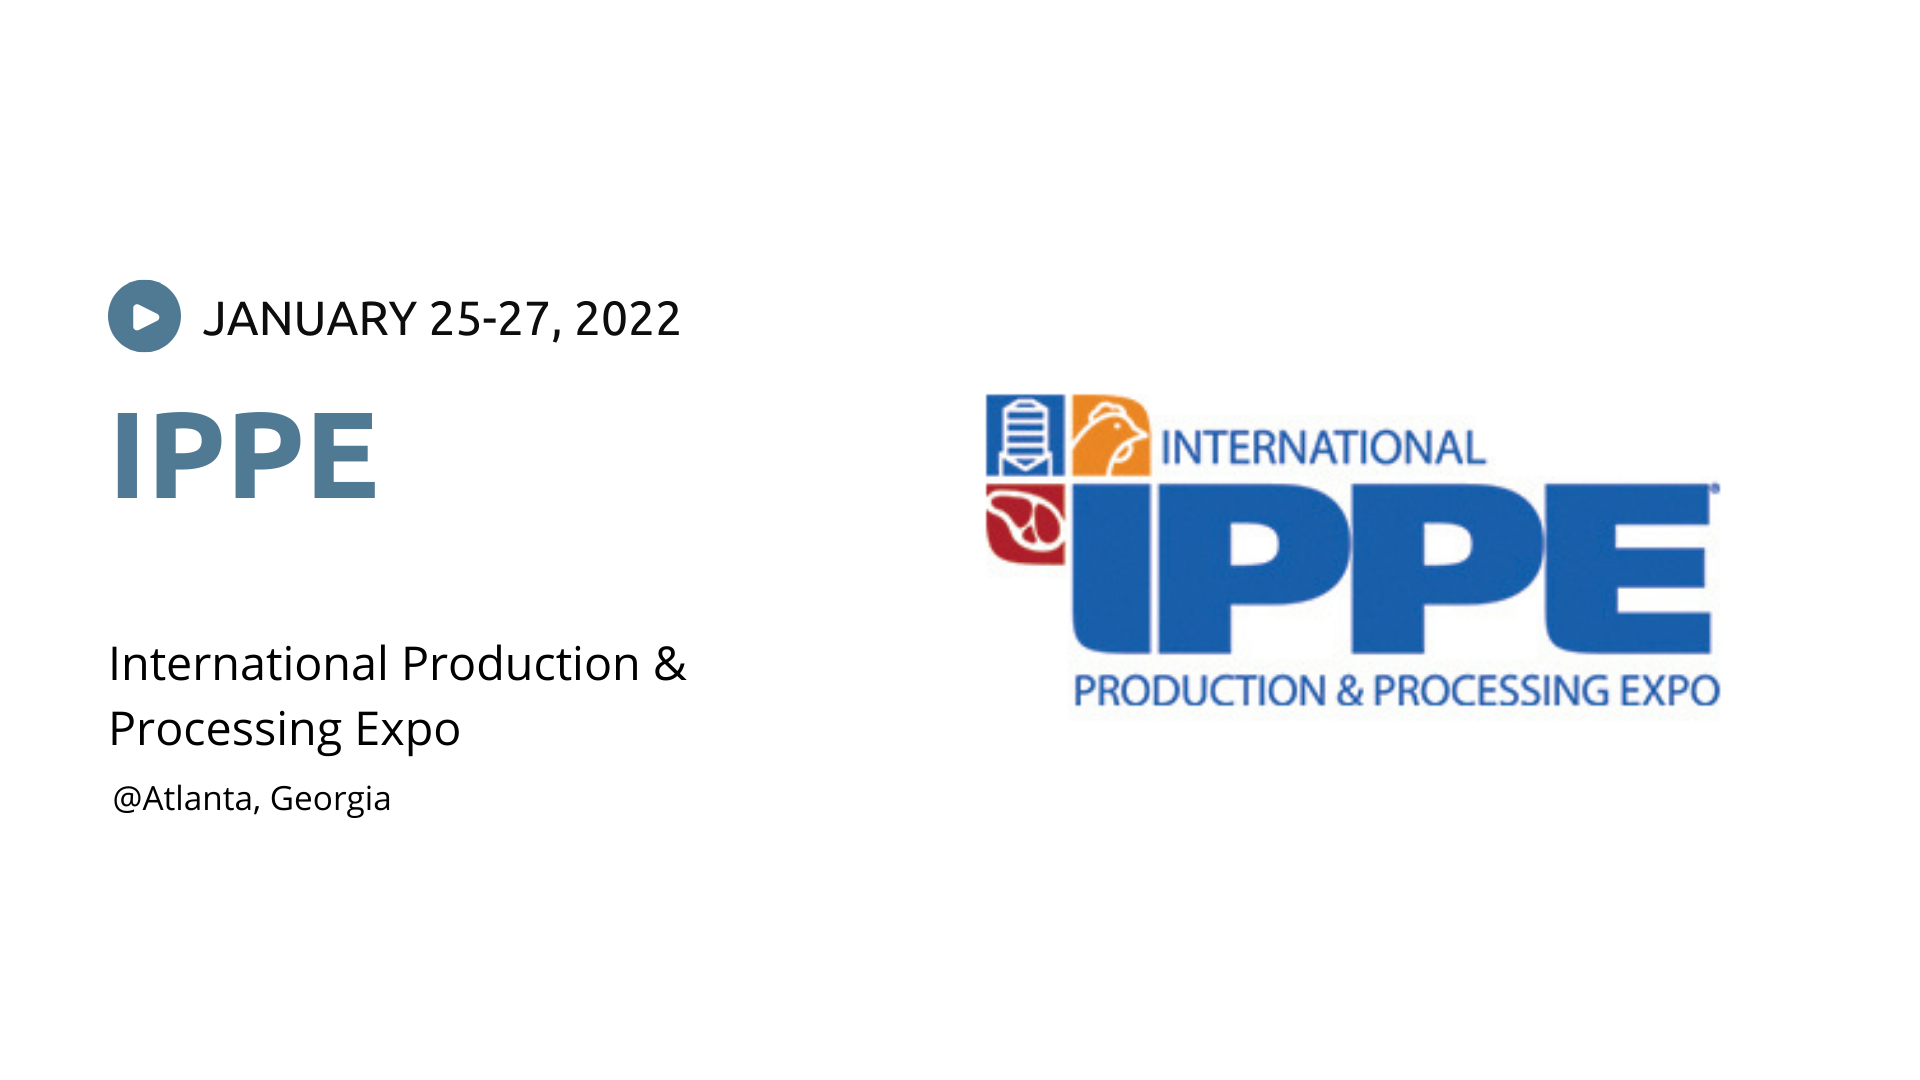 IPPE 2022